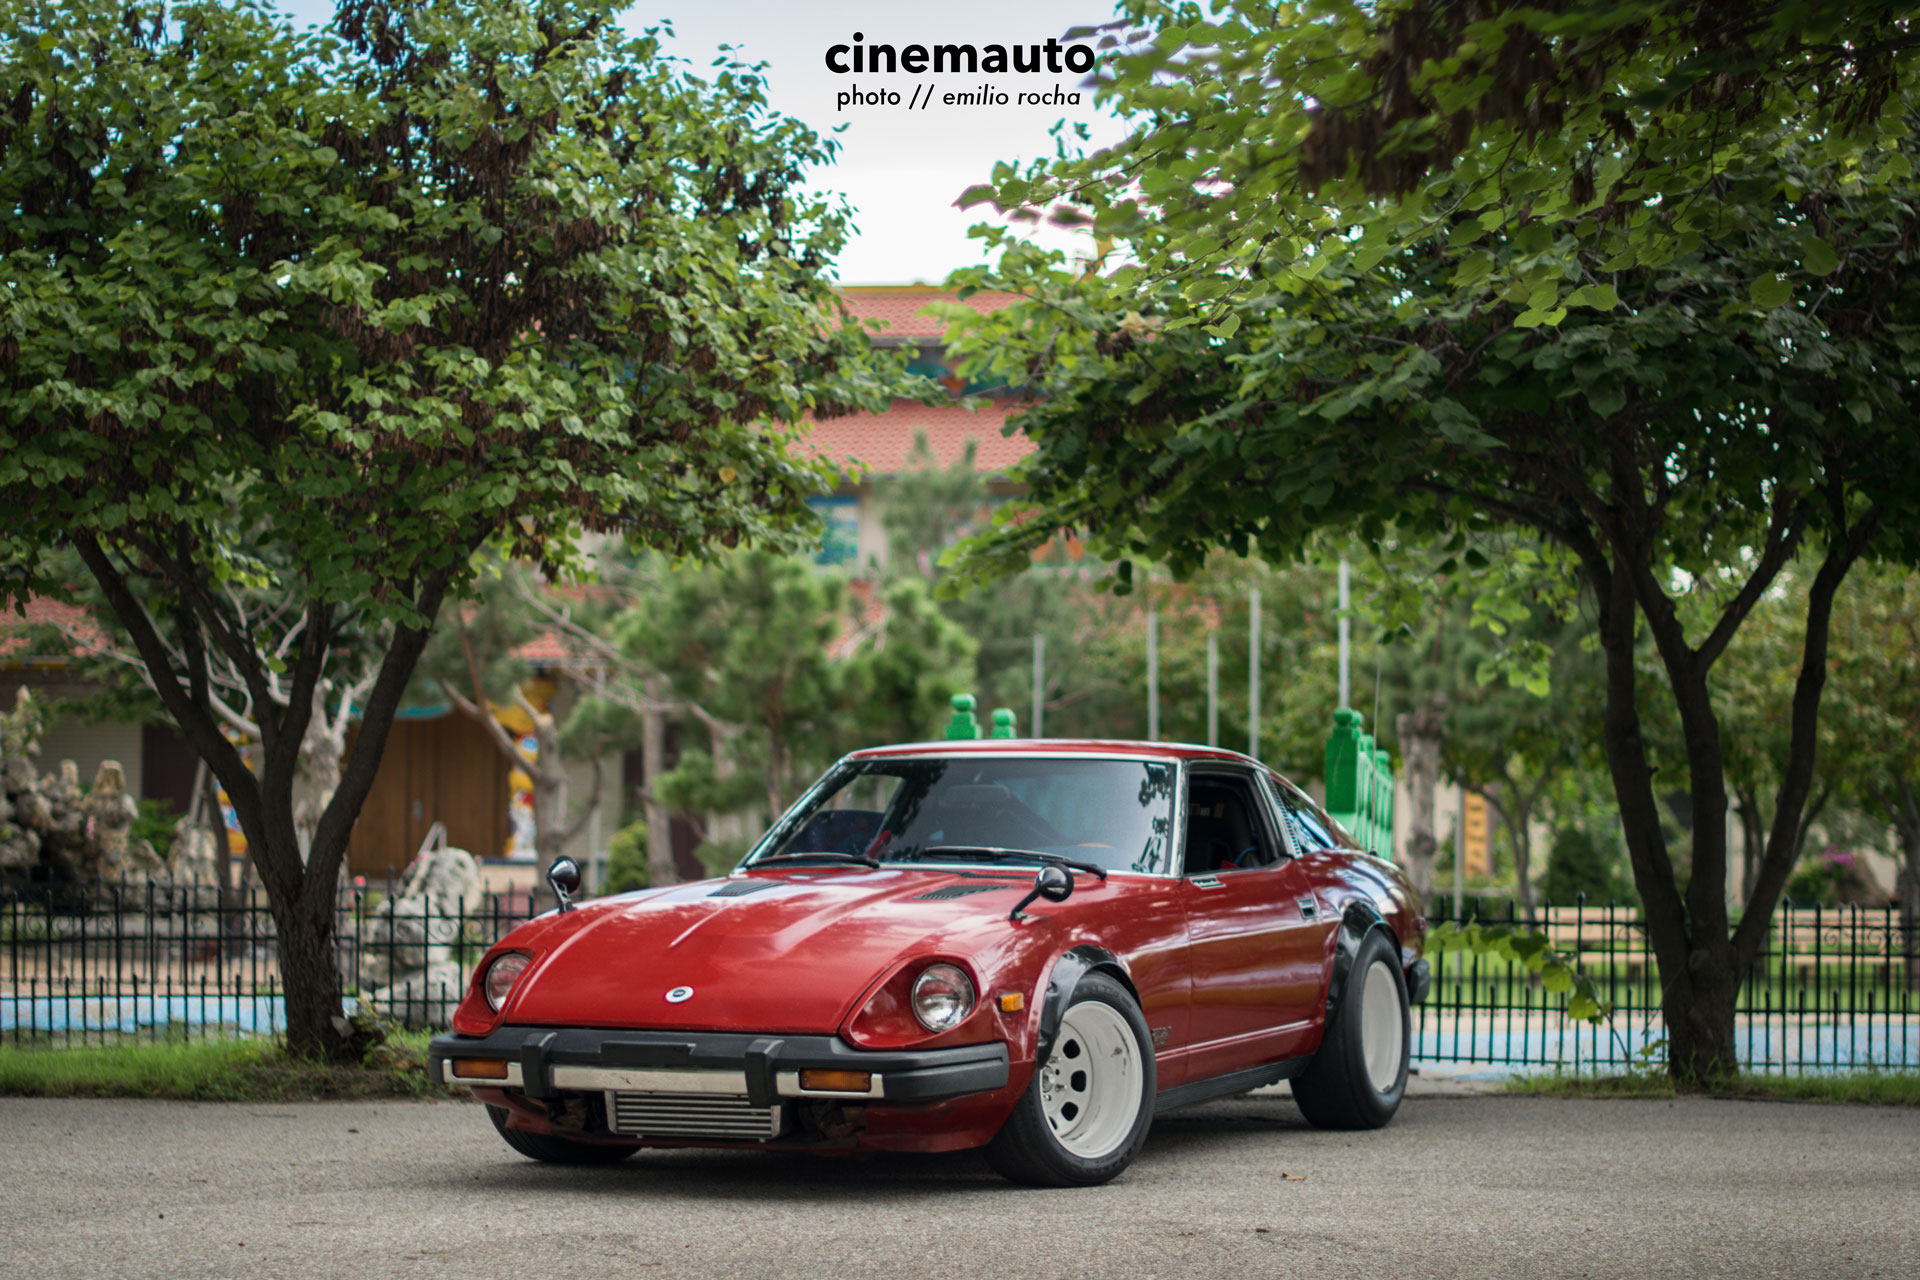 cinemauto-kansas-automotive-photography-datsun11.jpg